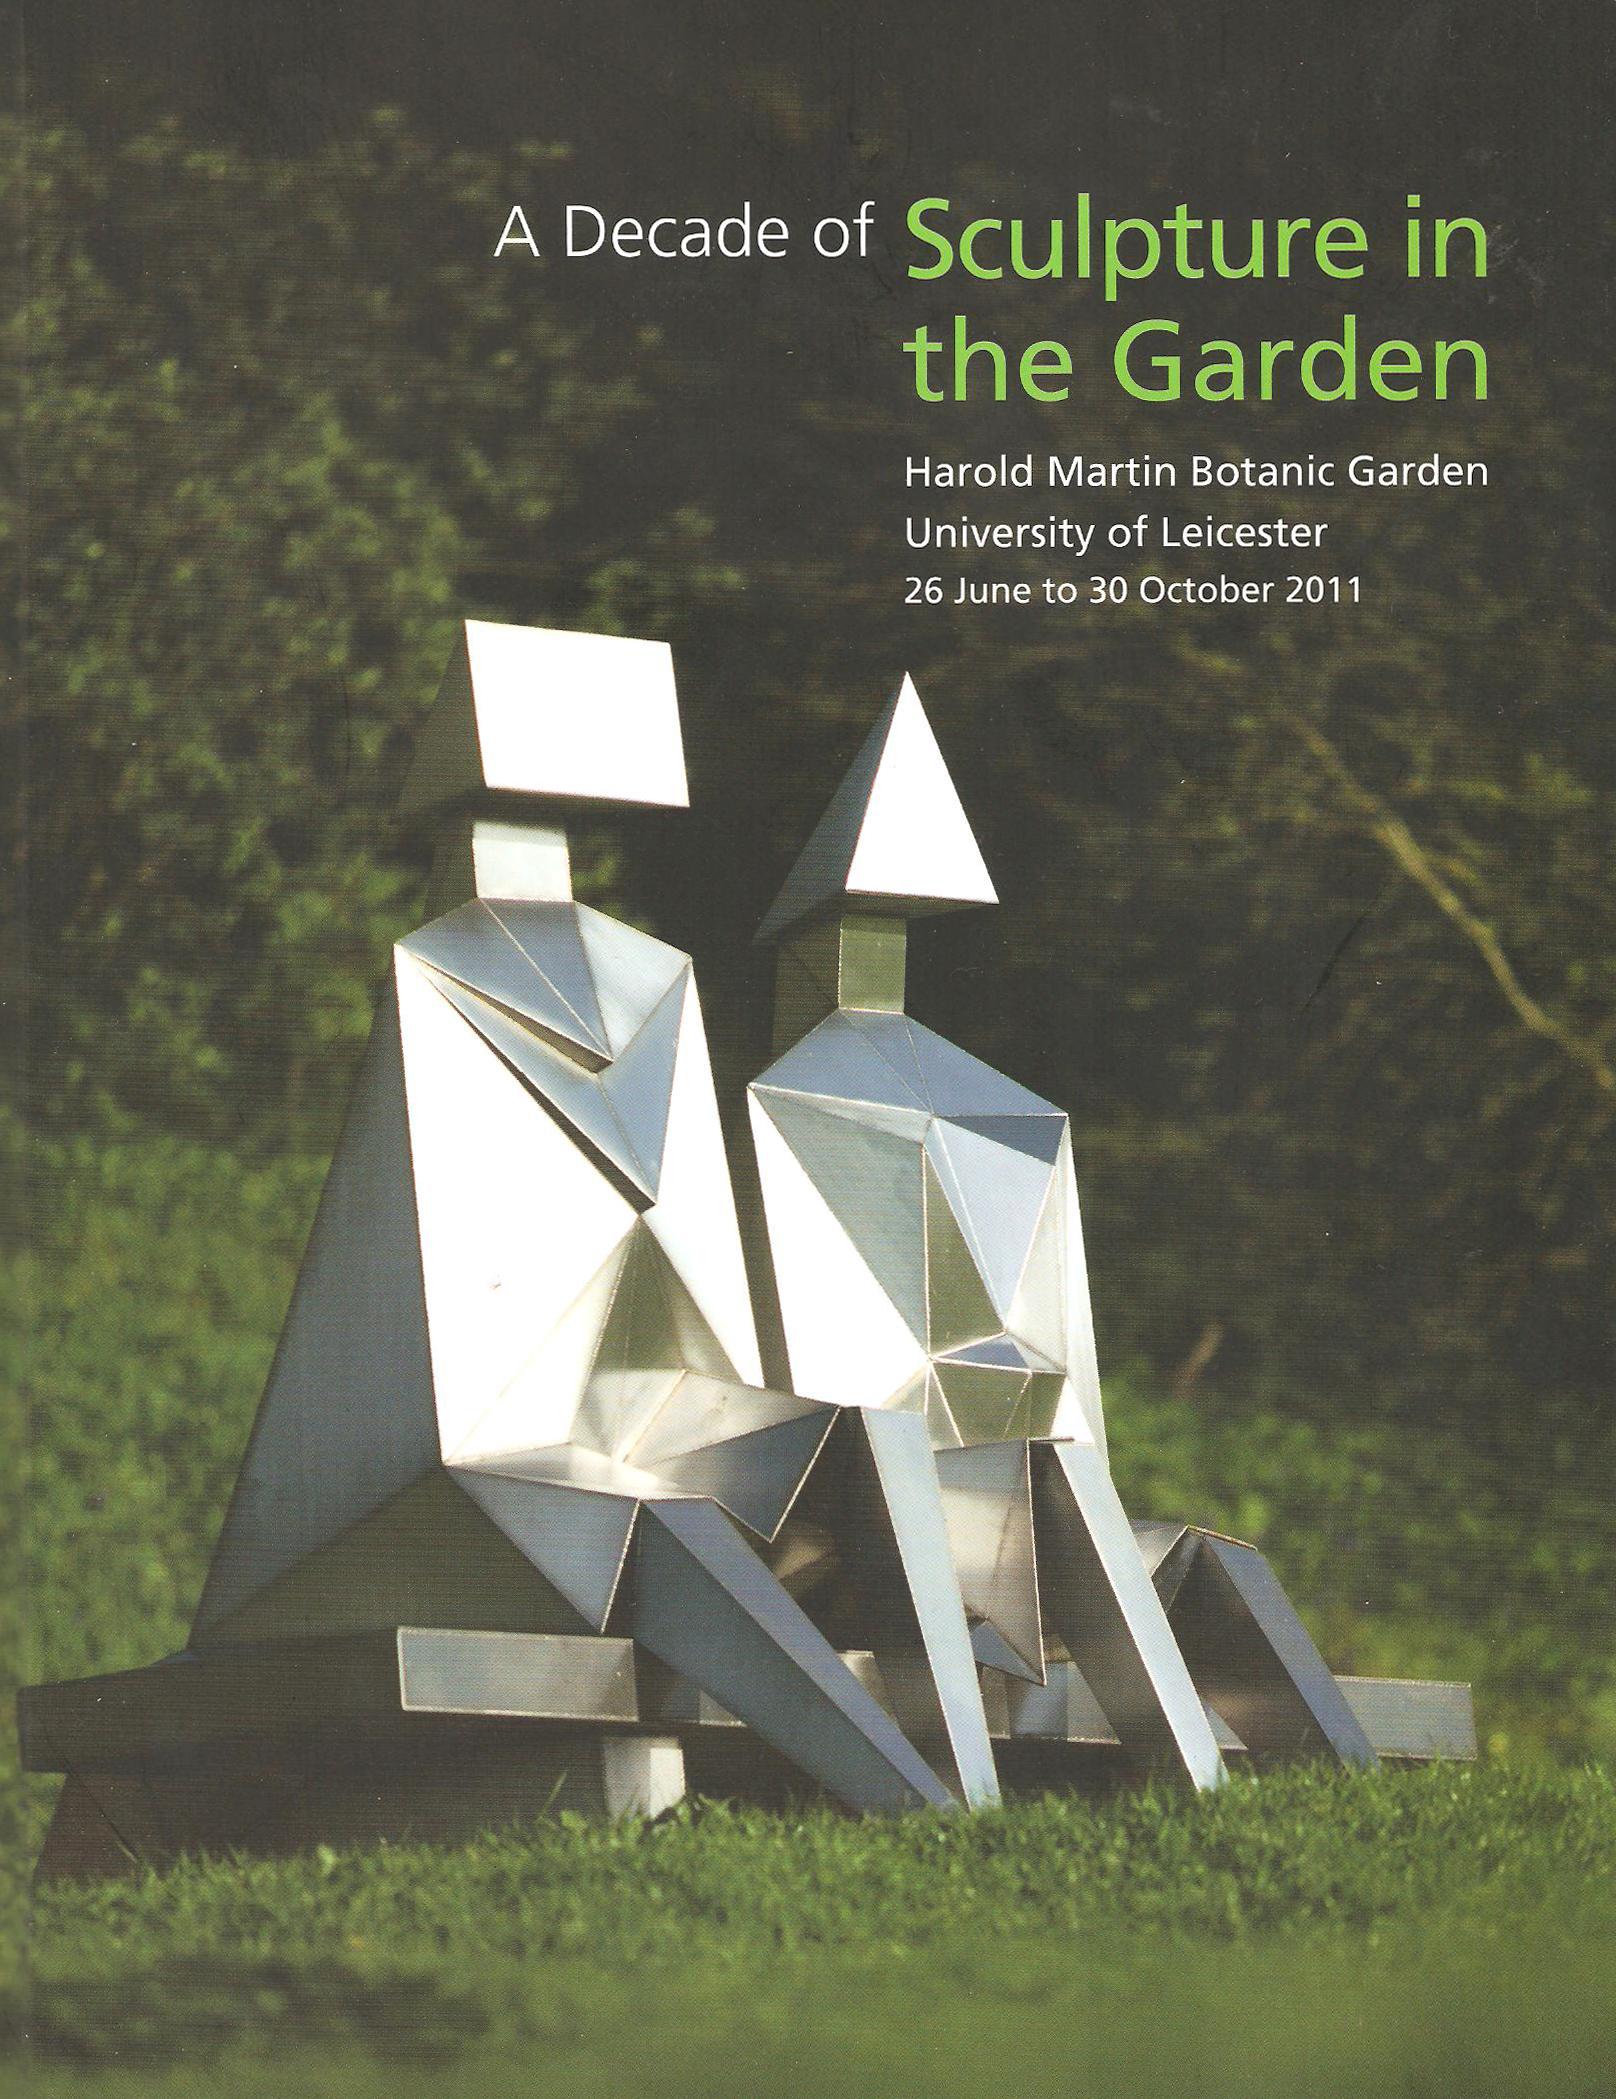 "2011 ""A Decade of Sculpture in the Garden"" Harold Martin Botanic Garden, University of Leicester 25 June - 30 October. Curator John Sidney Carter. ISBN 978-0-9564739-1-2 Univerity of Leicester Press."